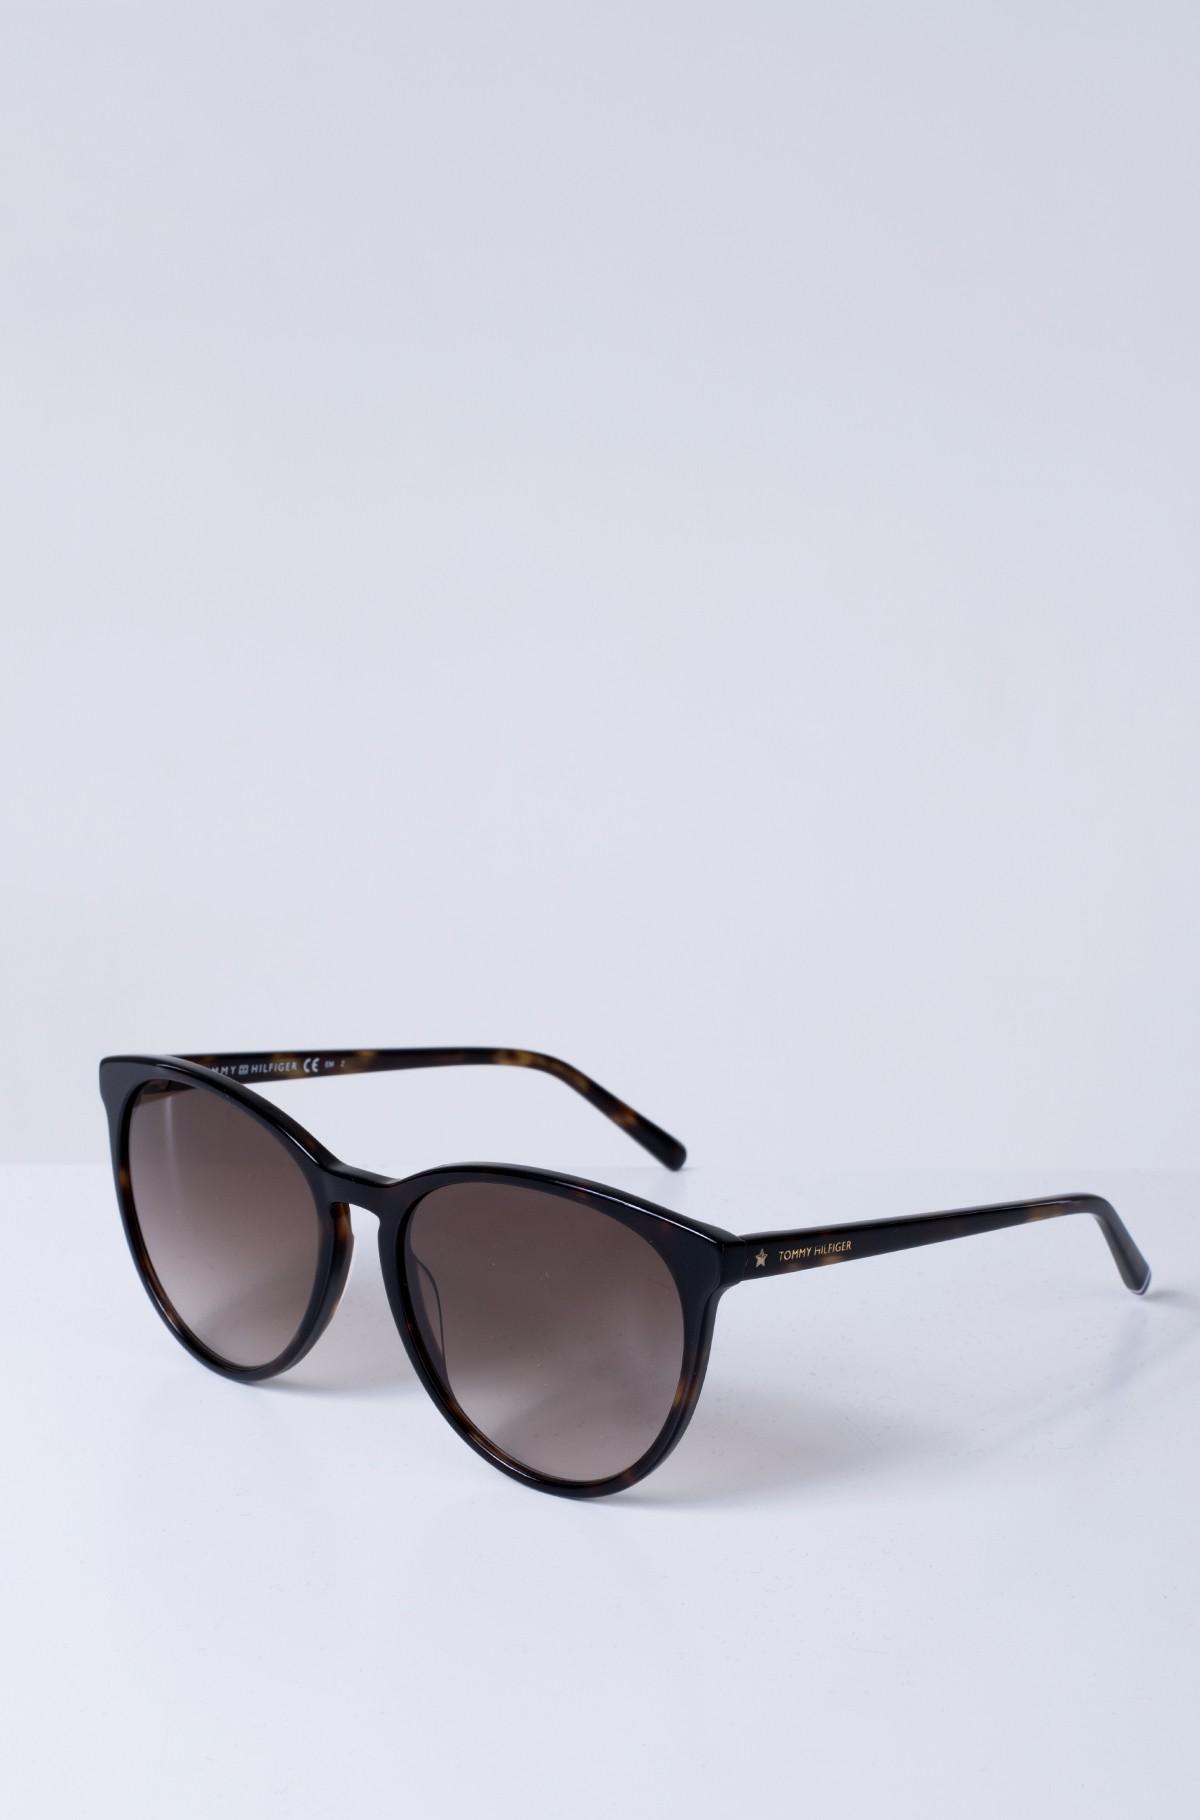 Sunglasses 1724/S-full-2